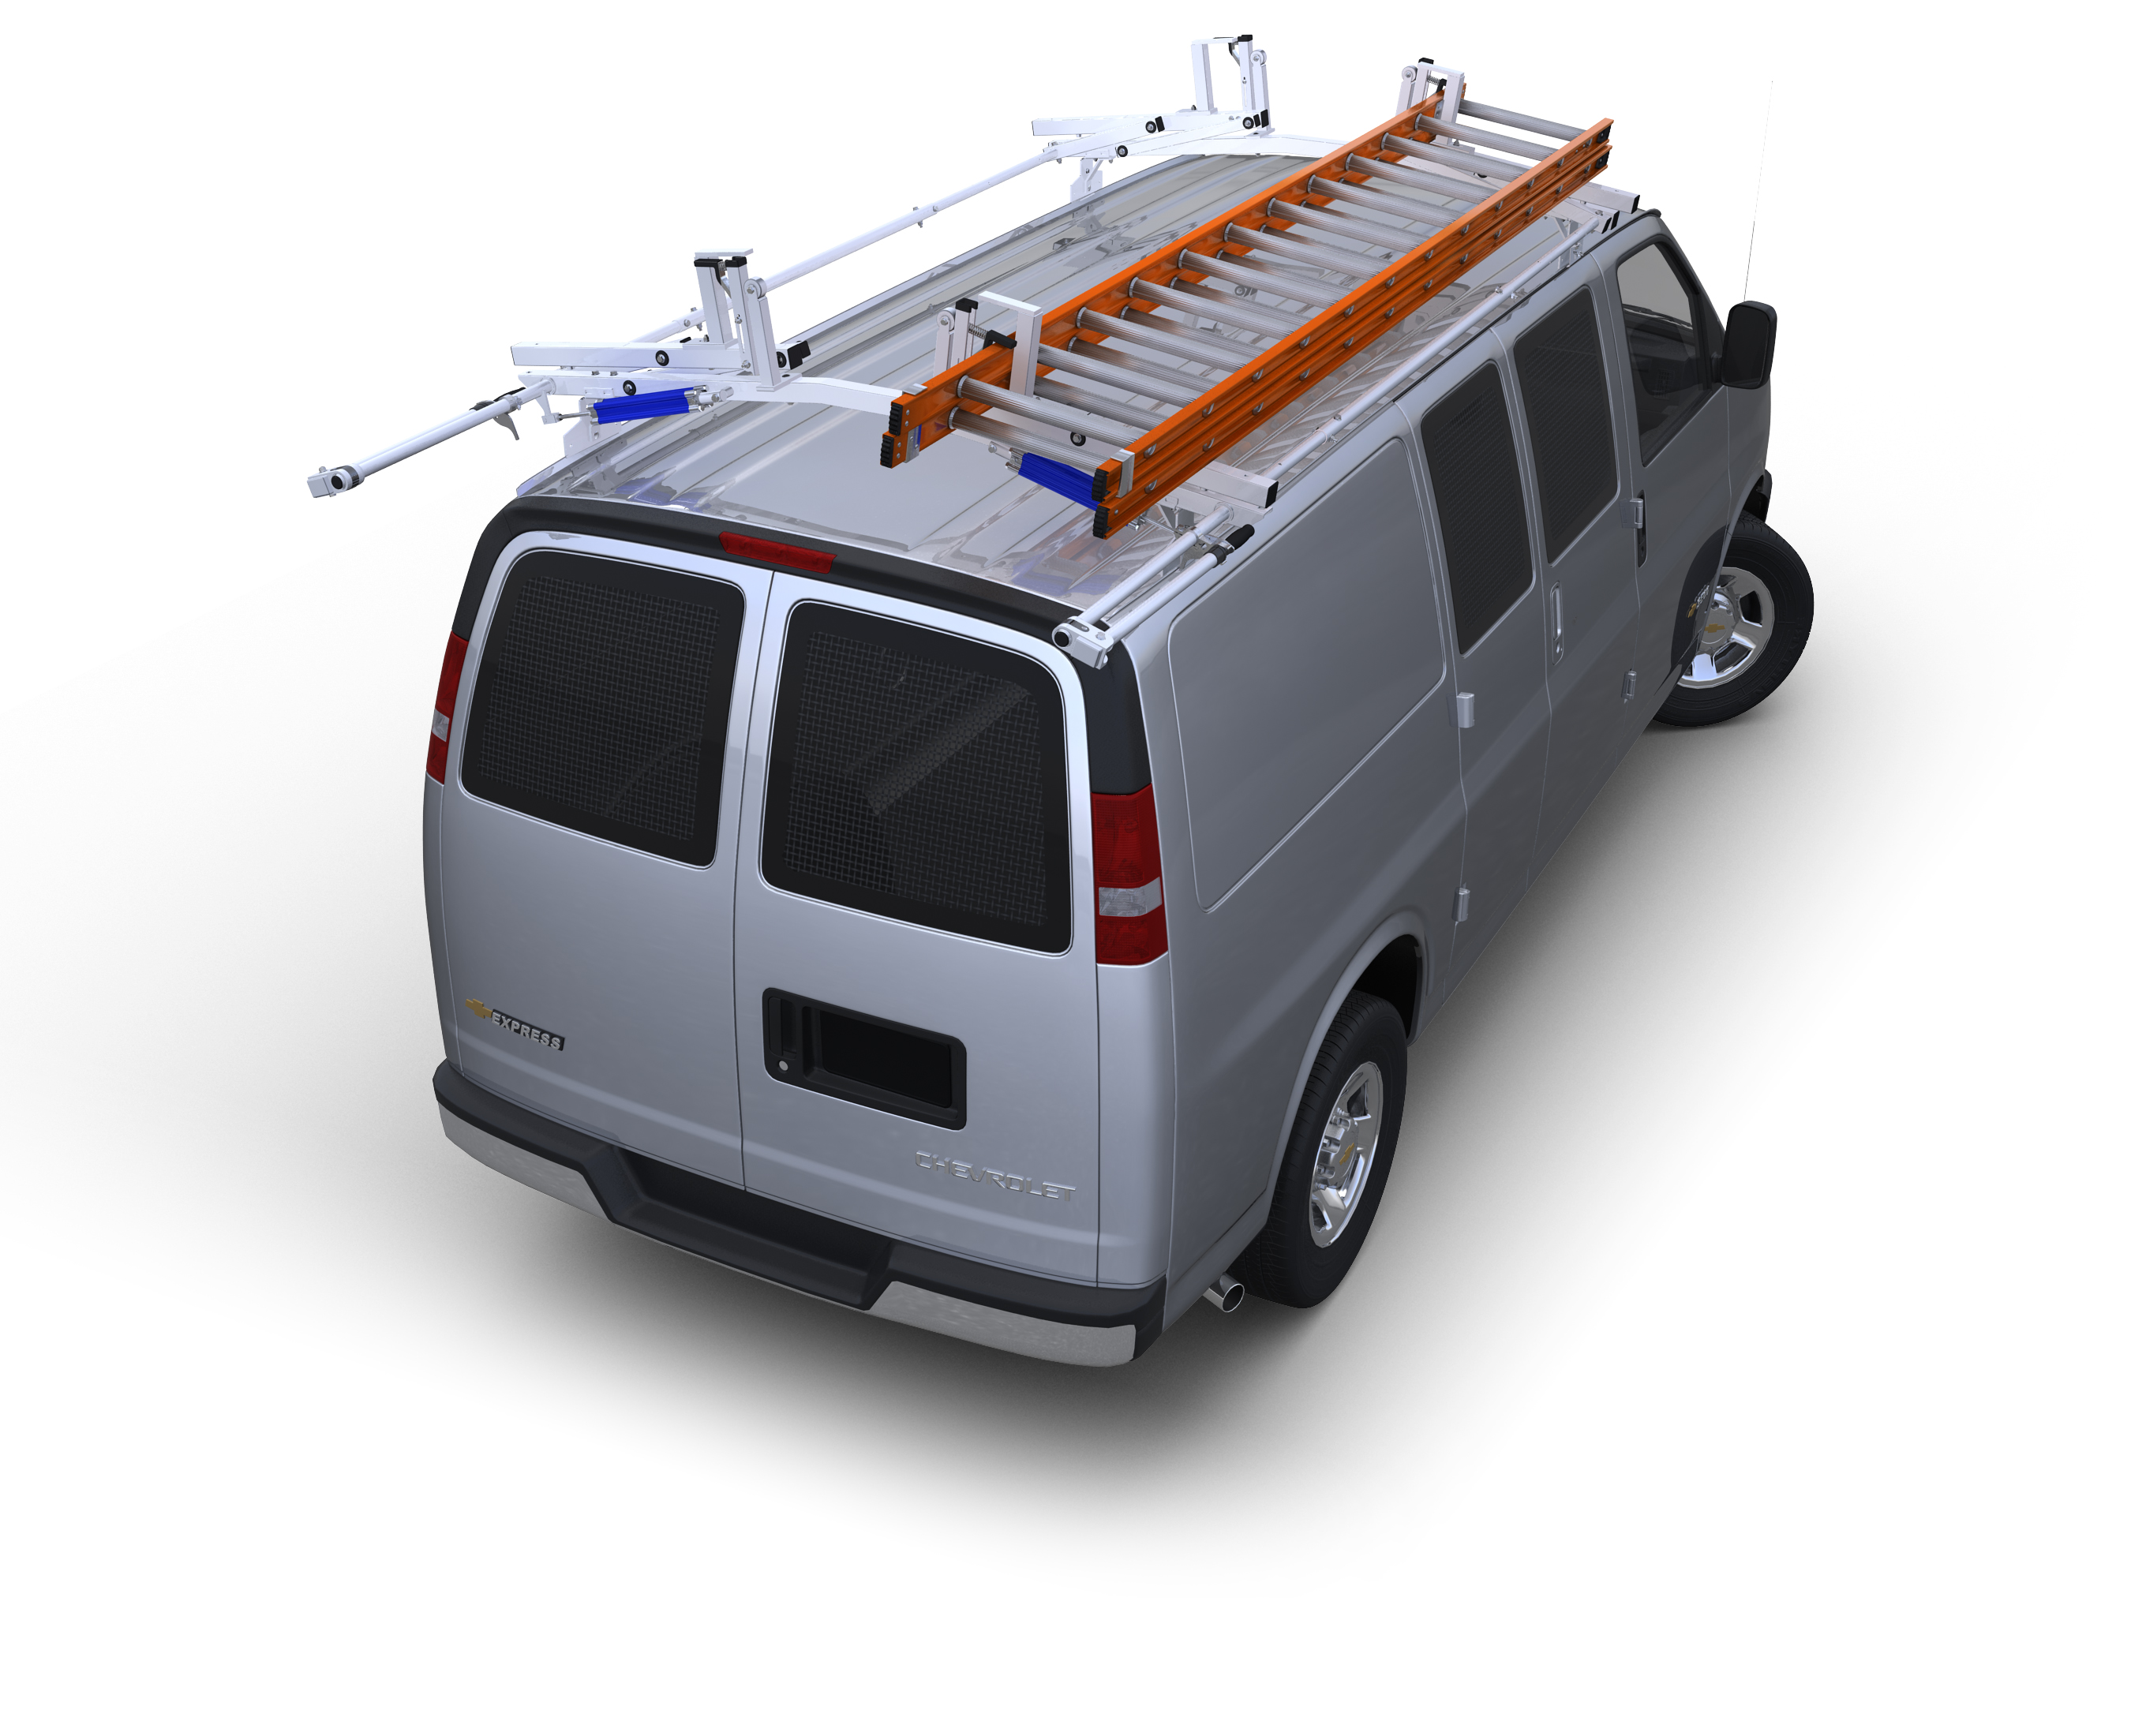 ProMaster City Base Van Package, Steel Shelving - SAVE $60!